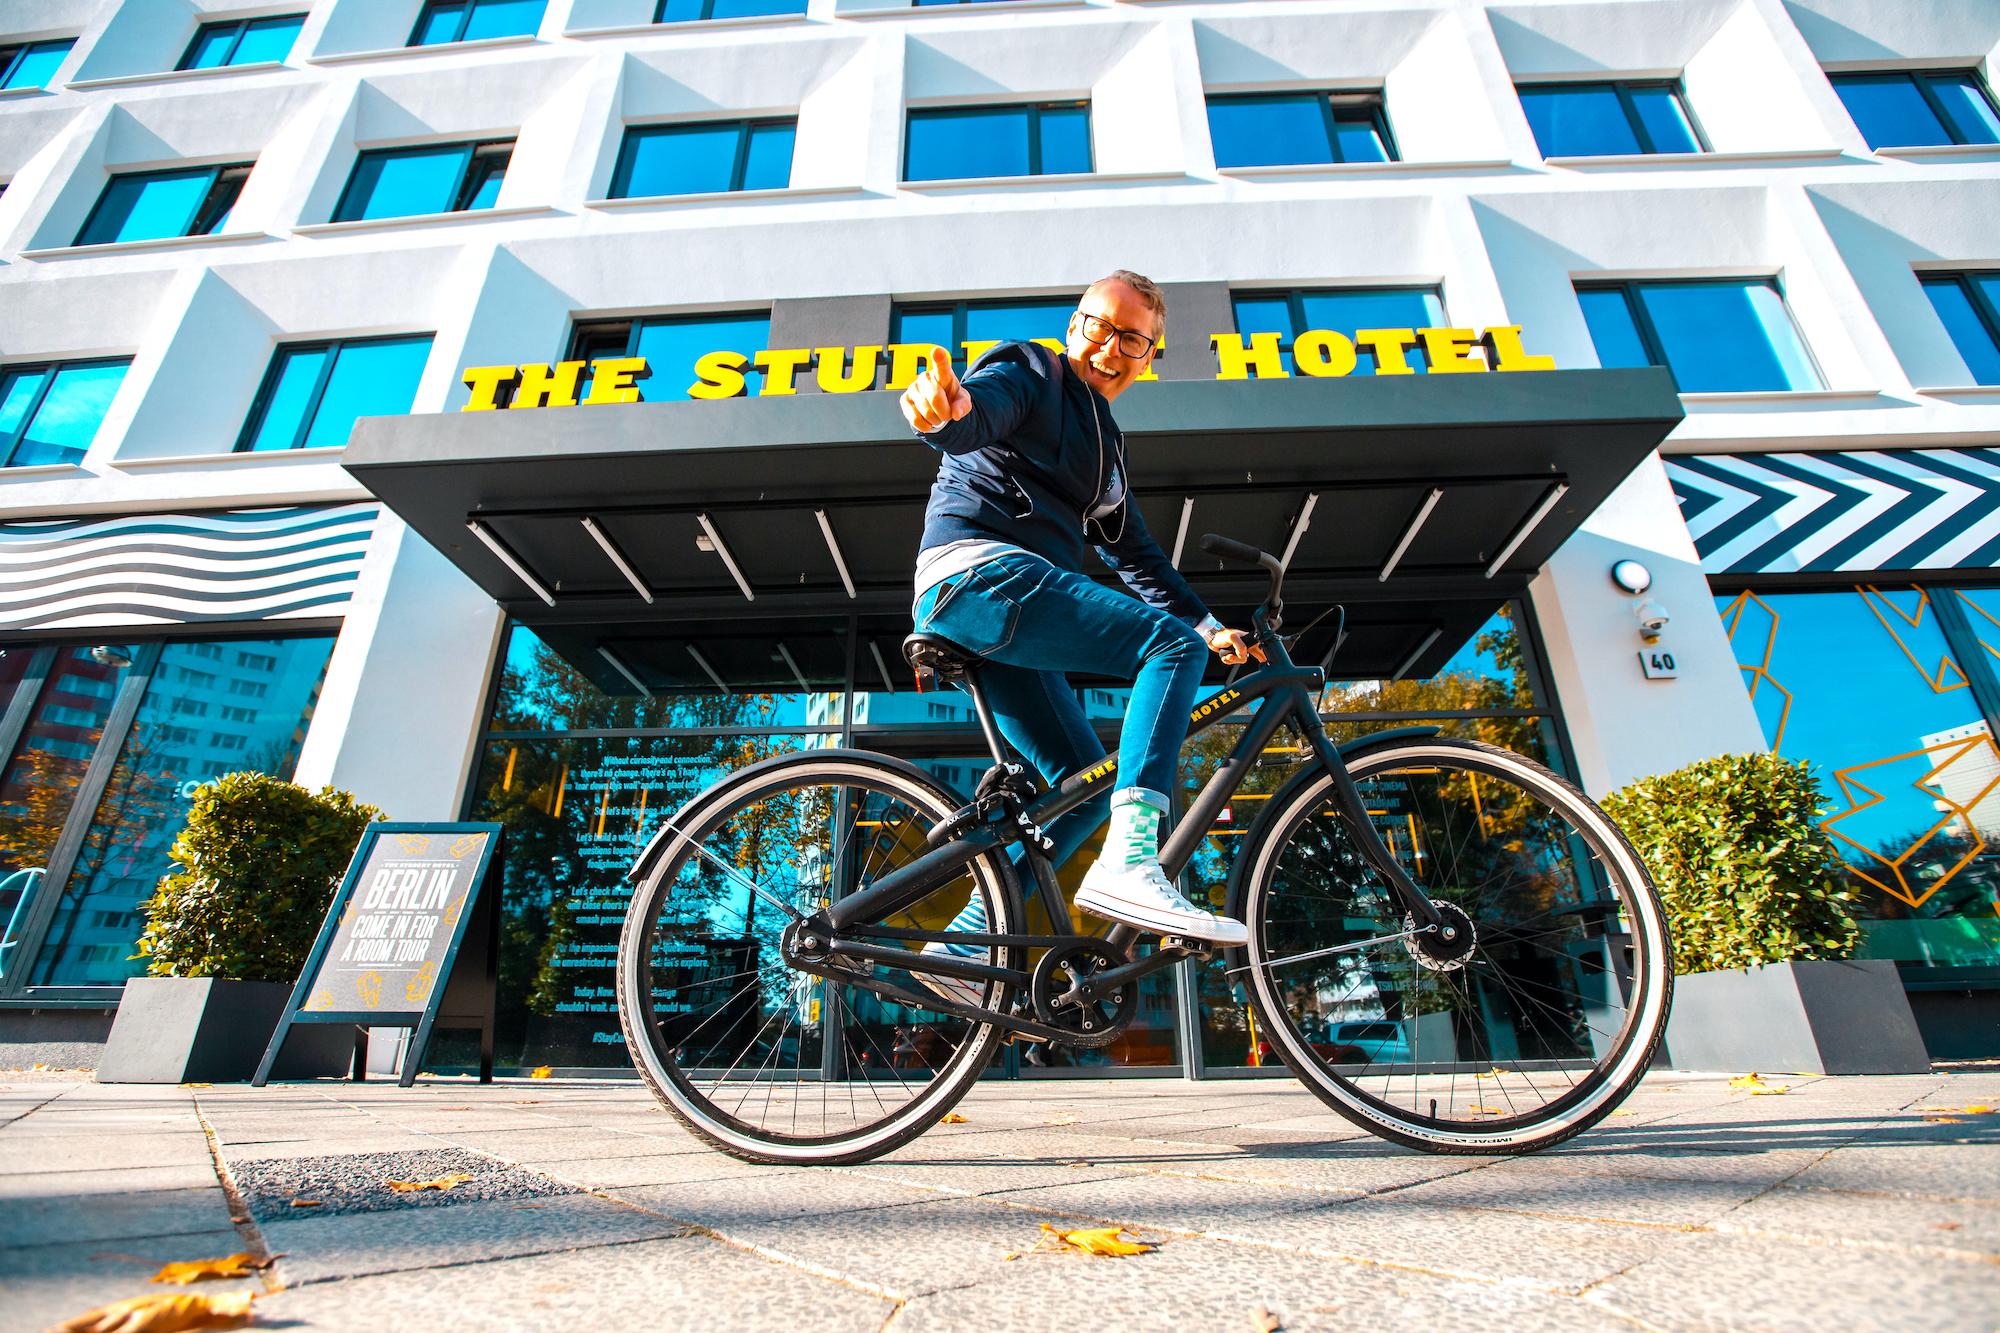 The Night Driver Gerry Bike eBike Mobility